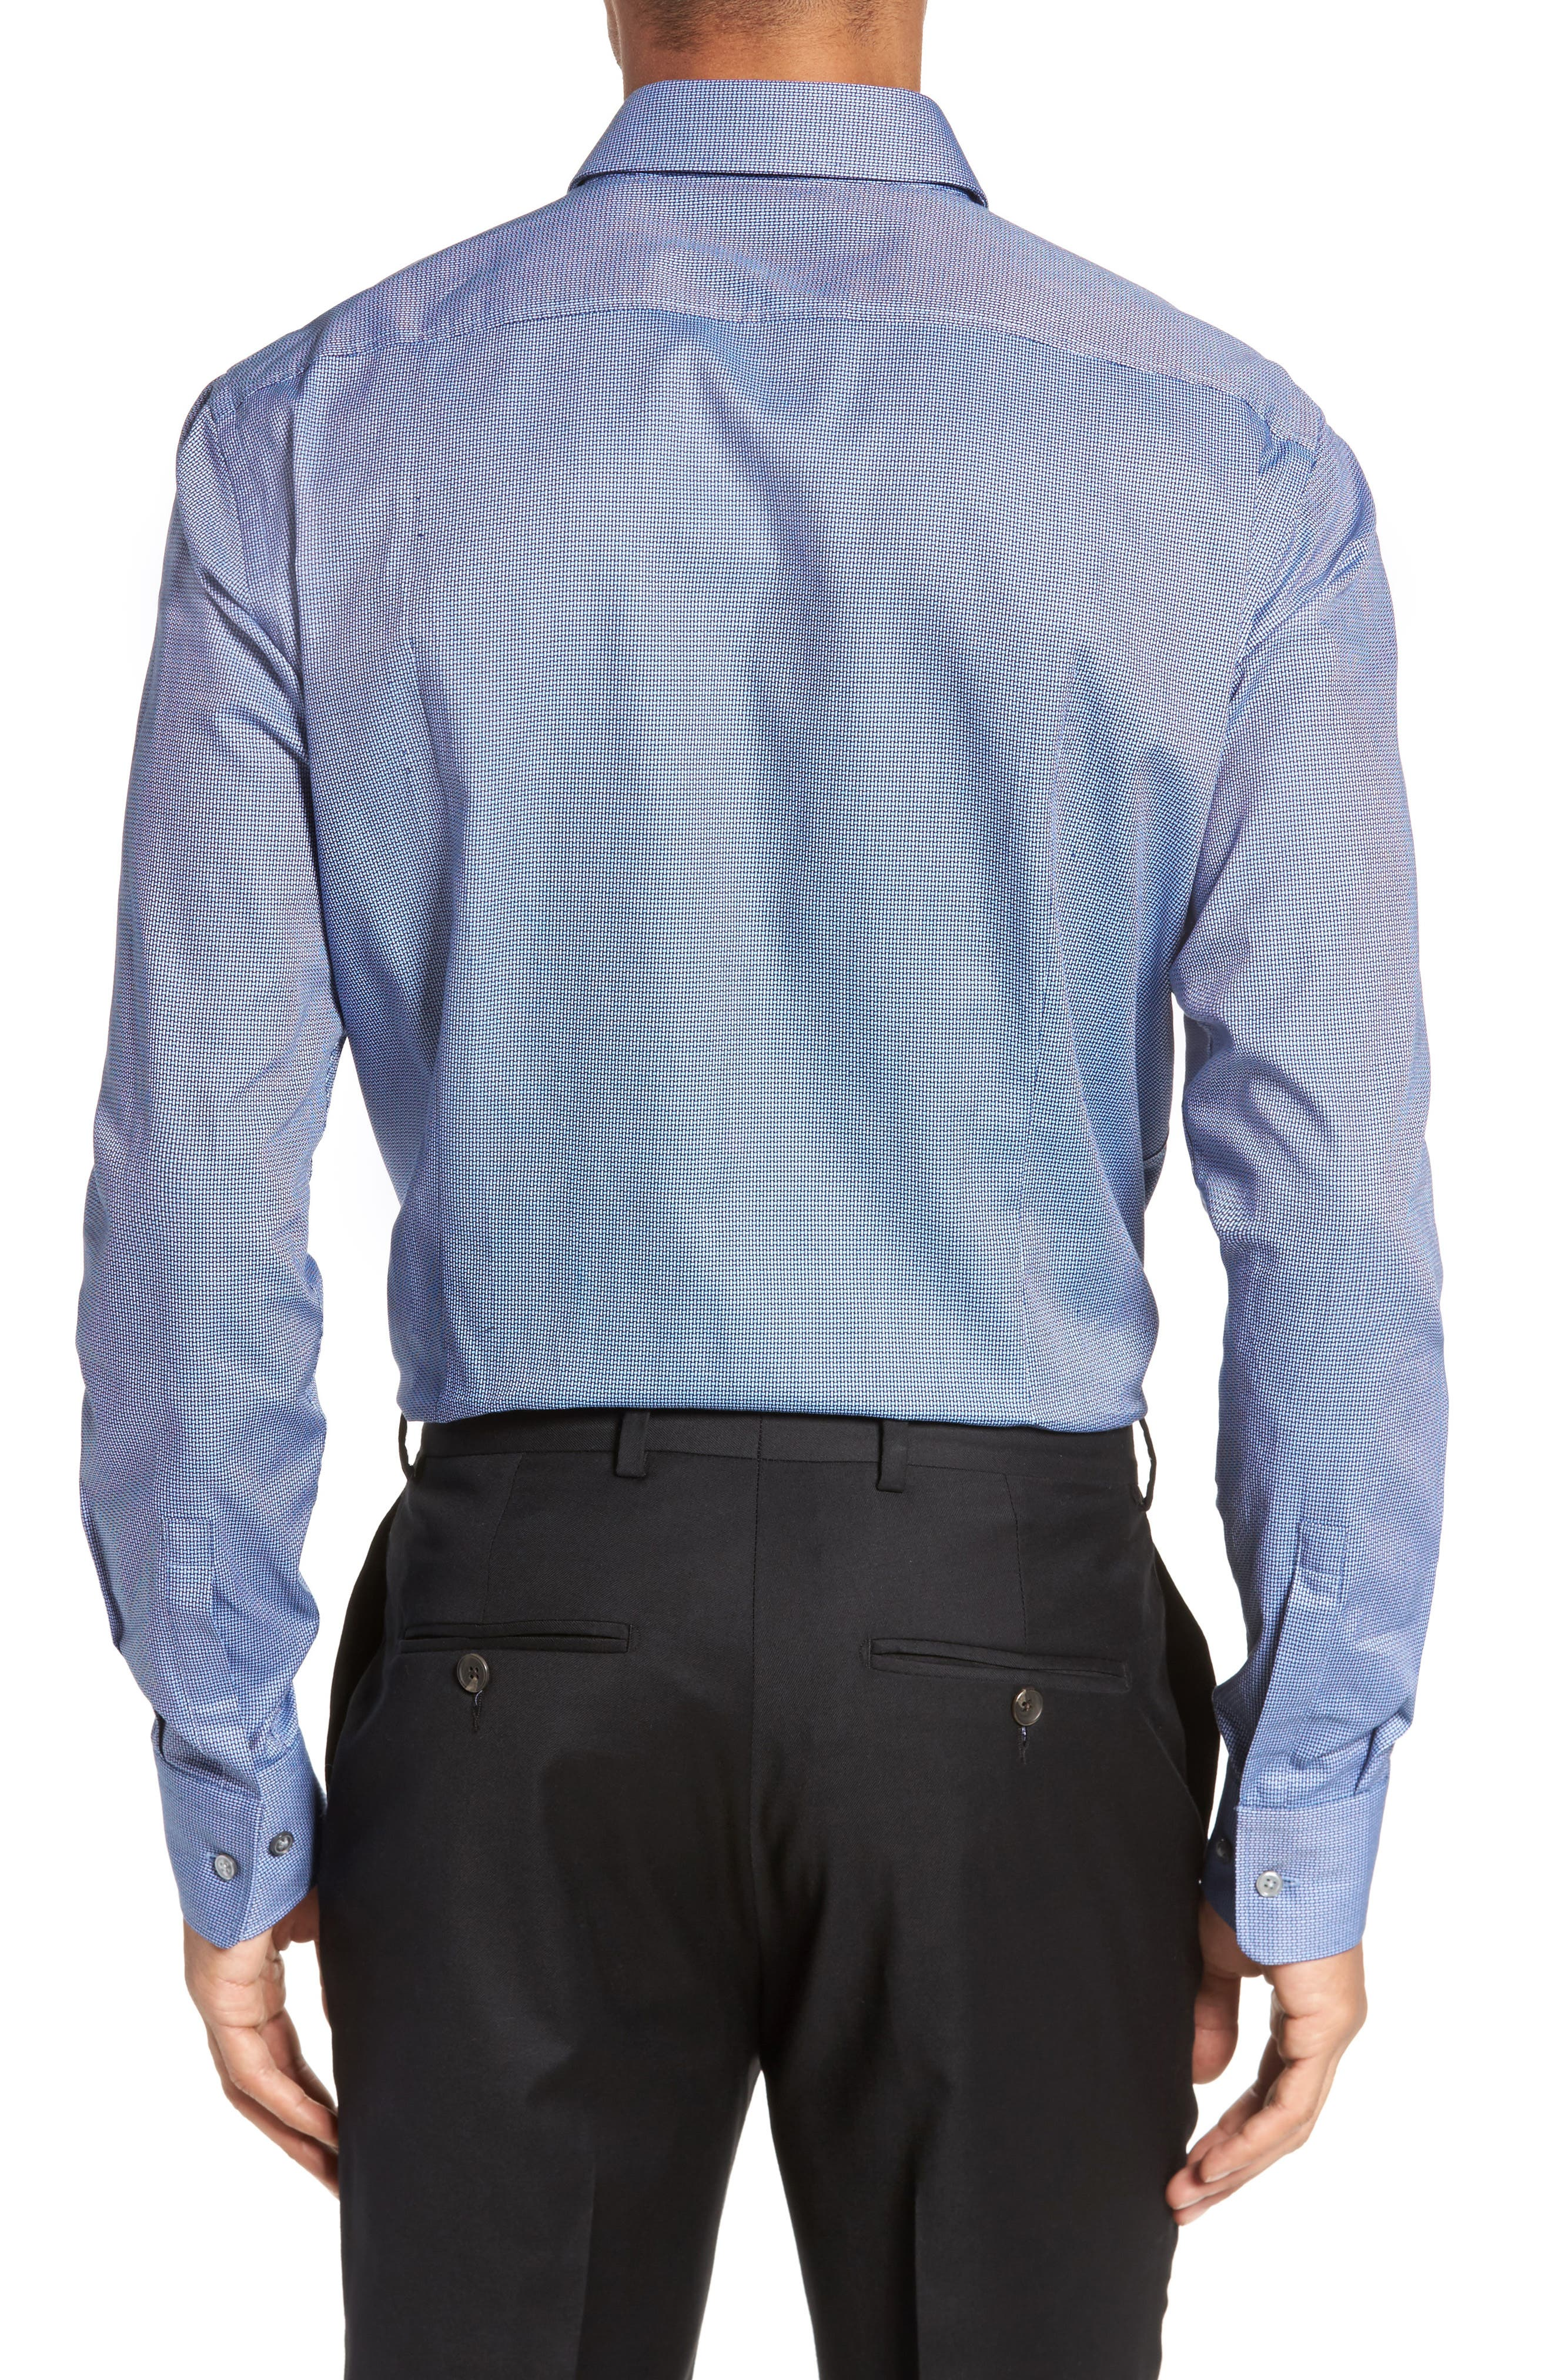 Marley Sharp Fit Solid Dress Shirt,                             Alternate thumbnail 2, color,                             410